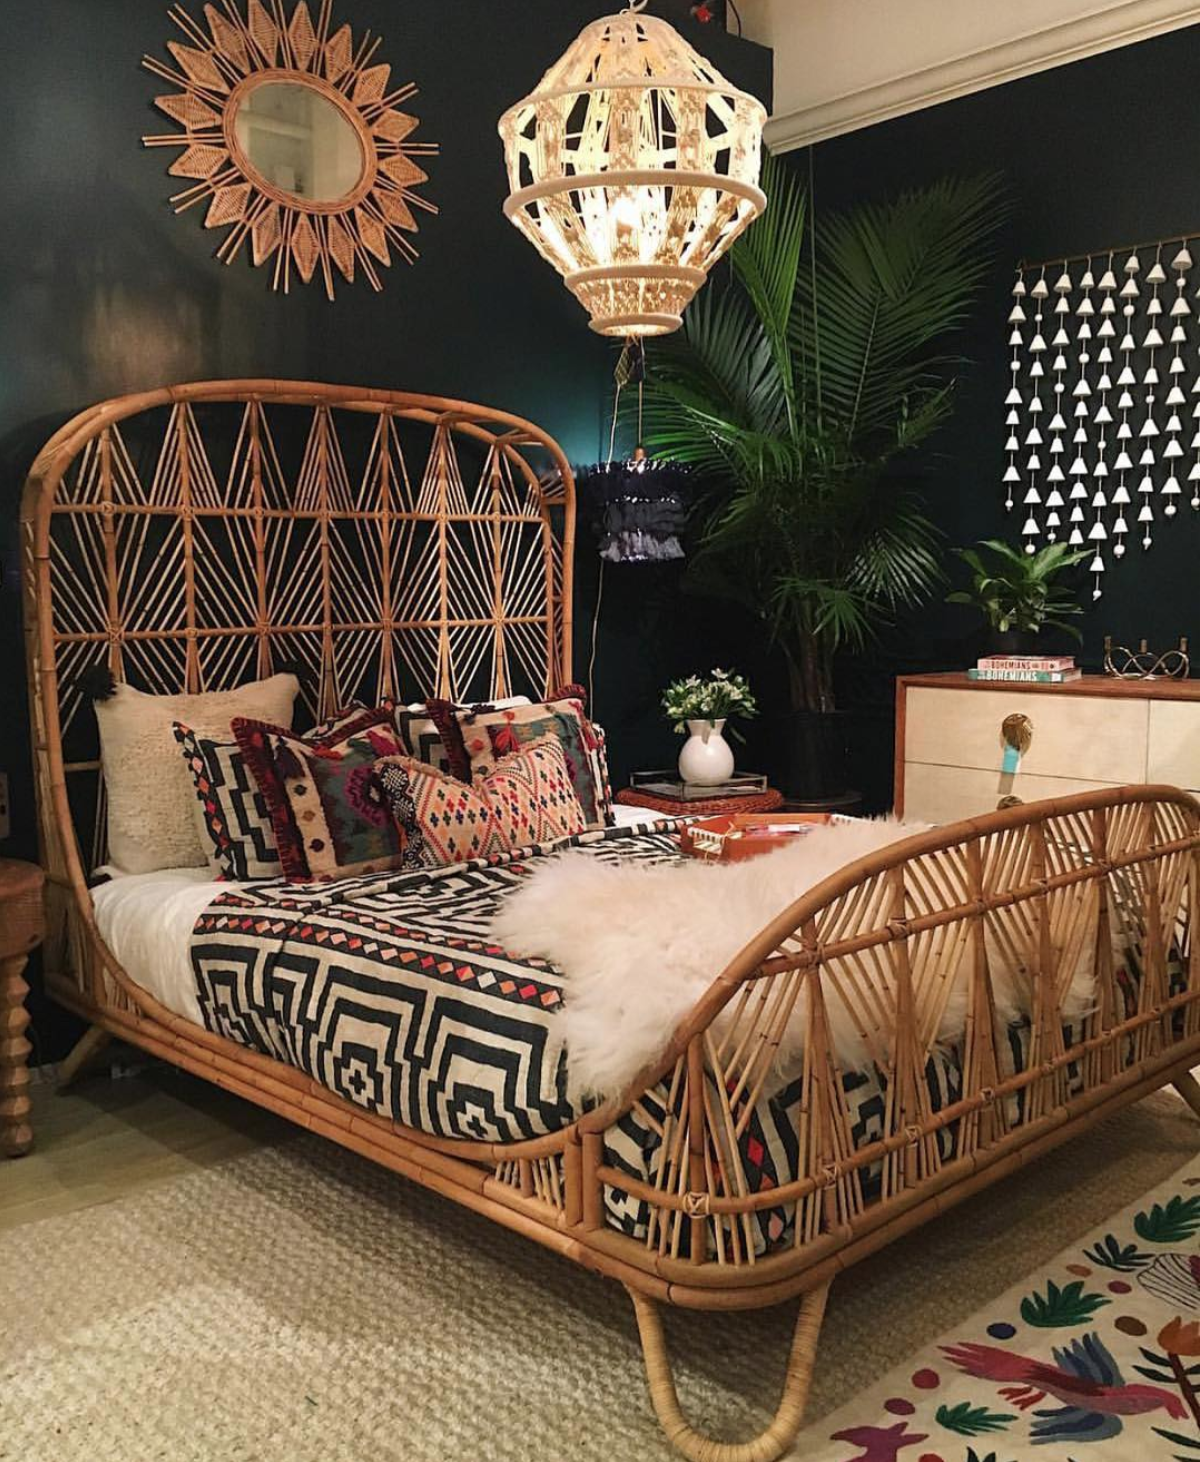 10 Mind Blowing Eclectic Interior Design Ideas Remodel Bedroom